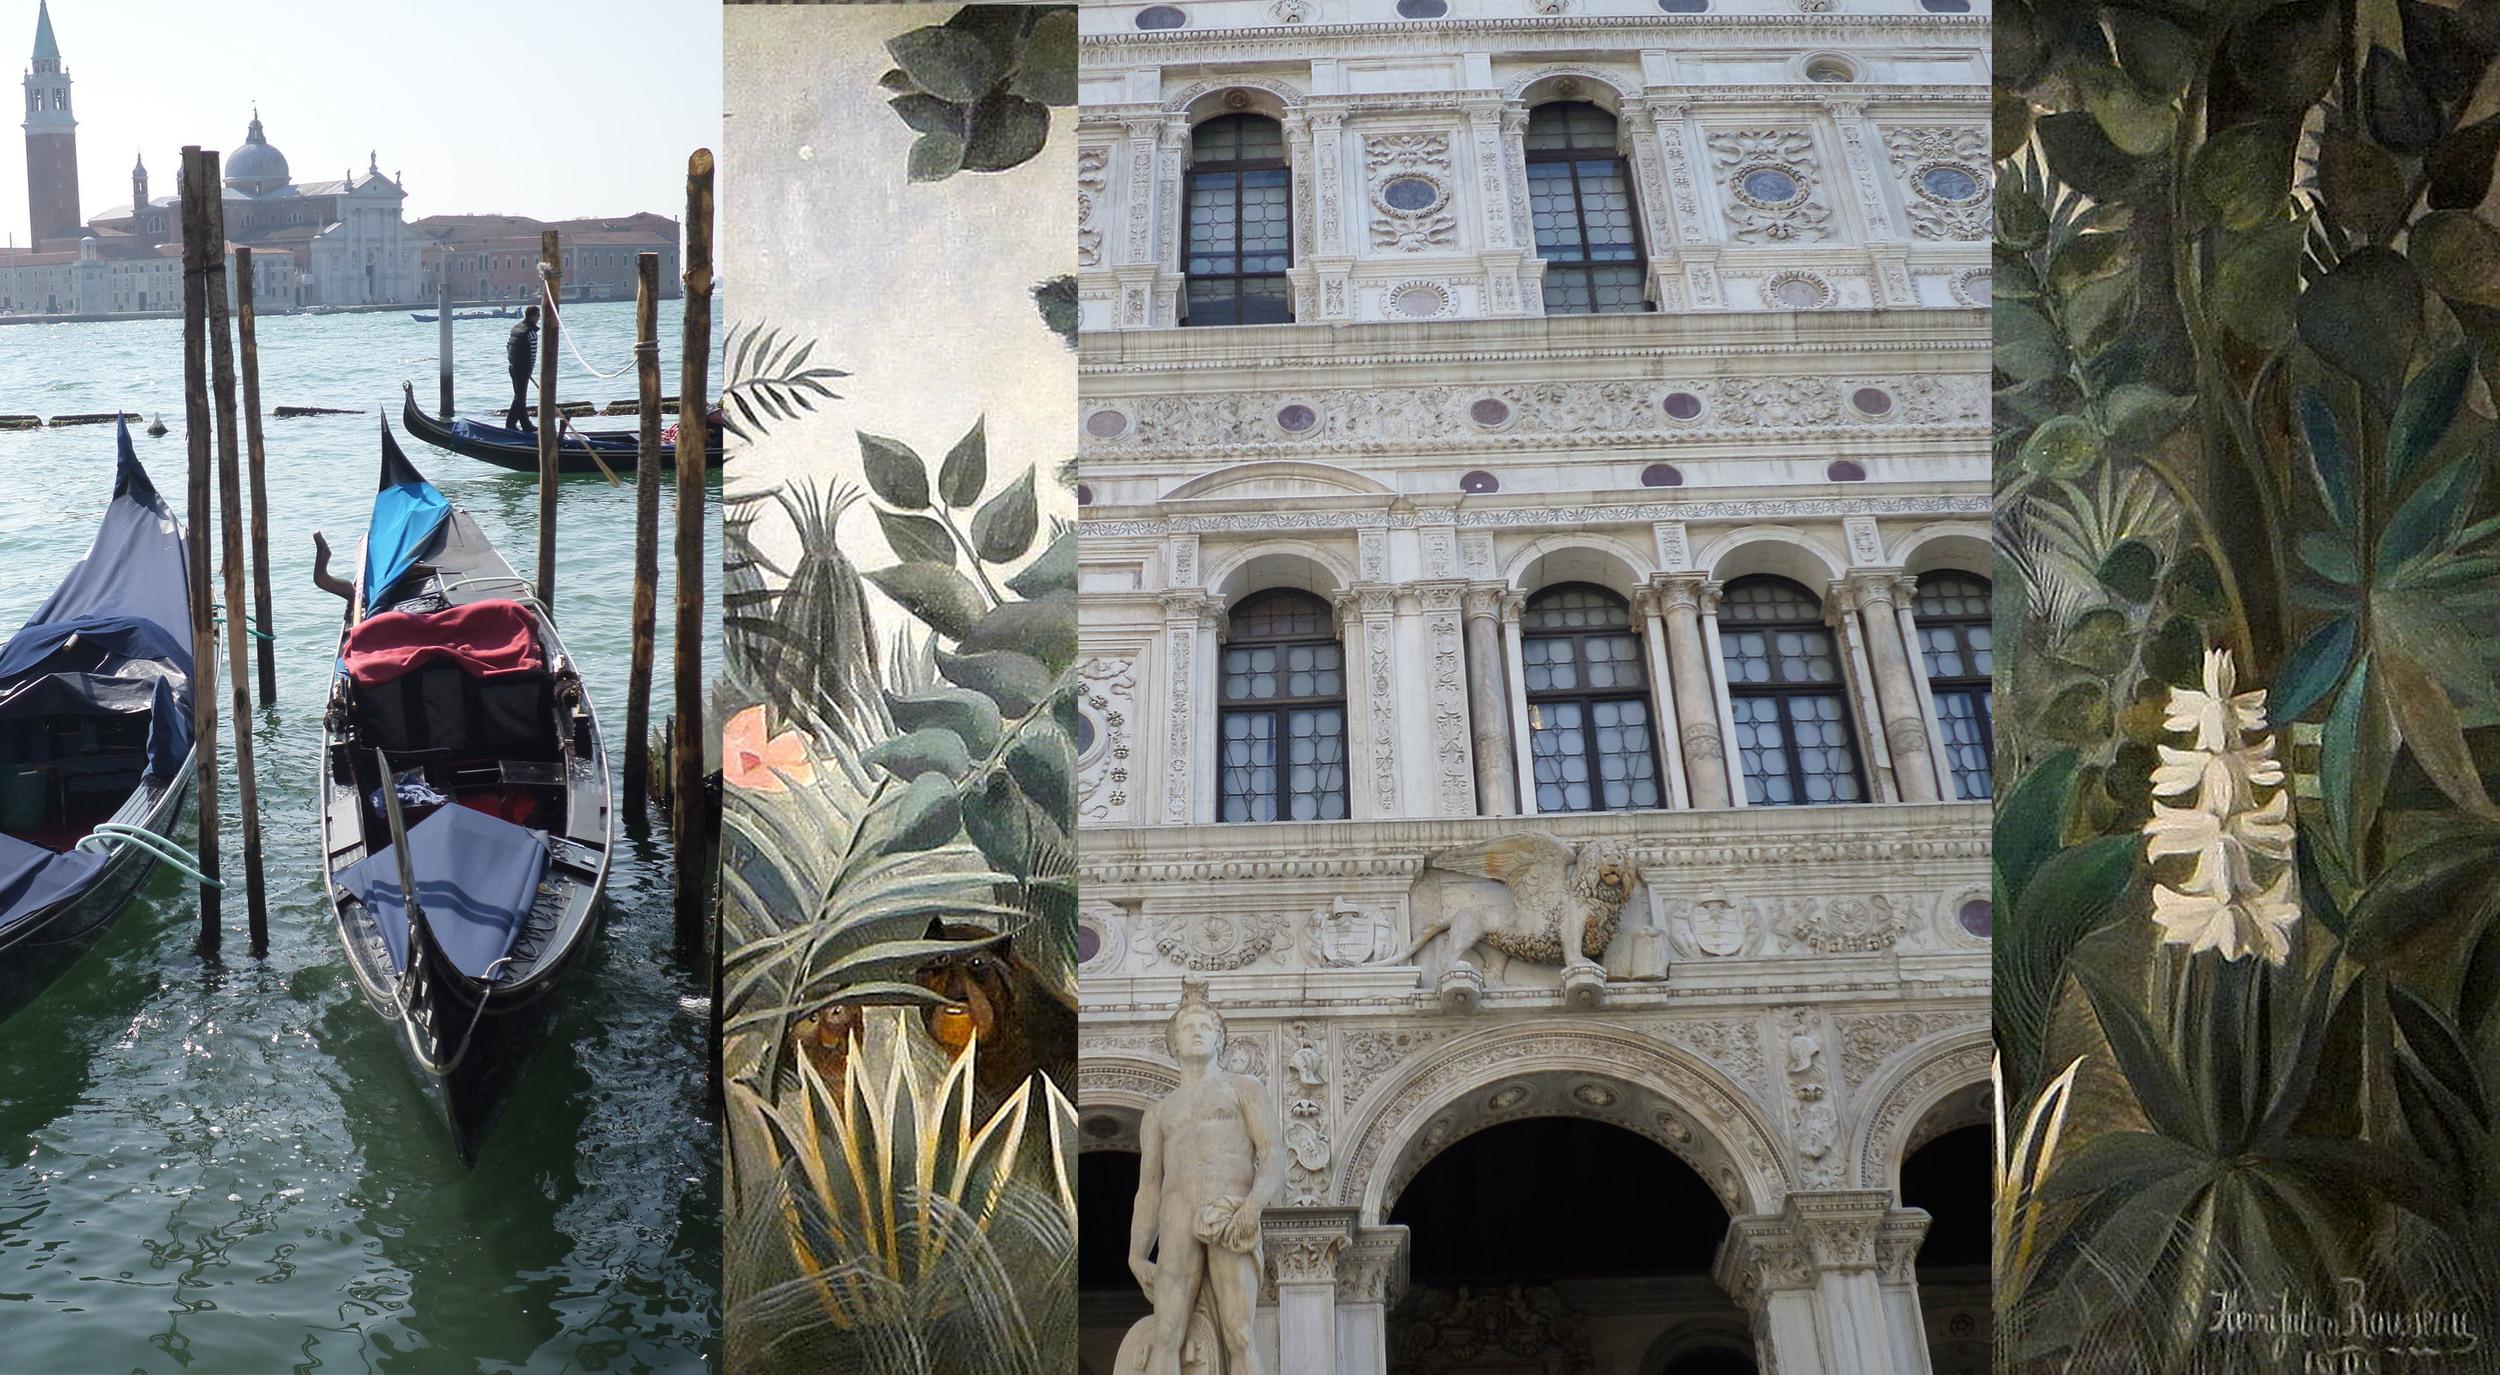 Venice - Palazzo Ducale - Henri Rouseeau exhibition